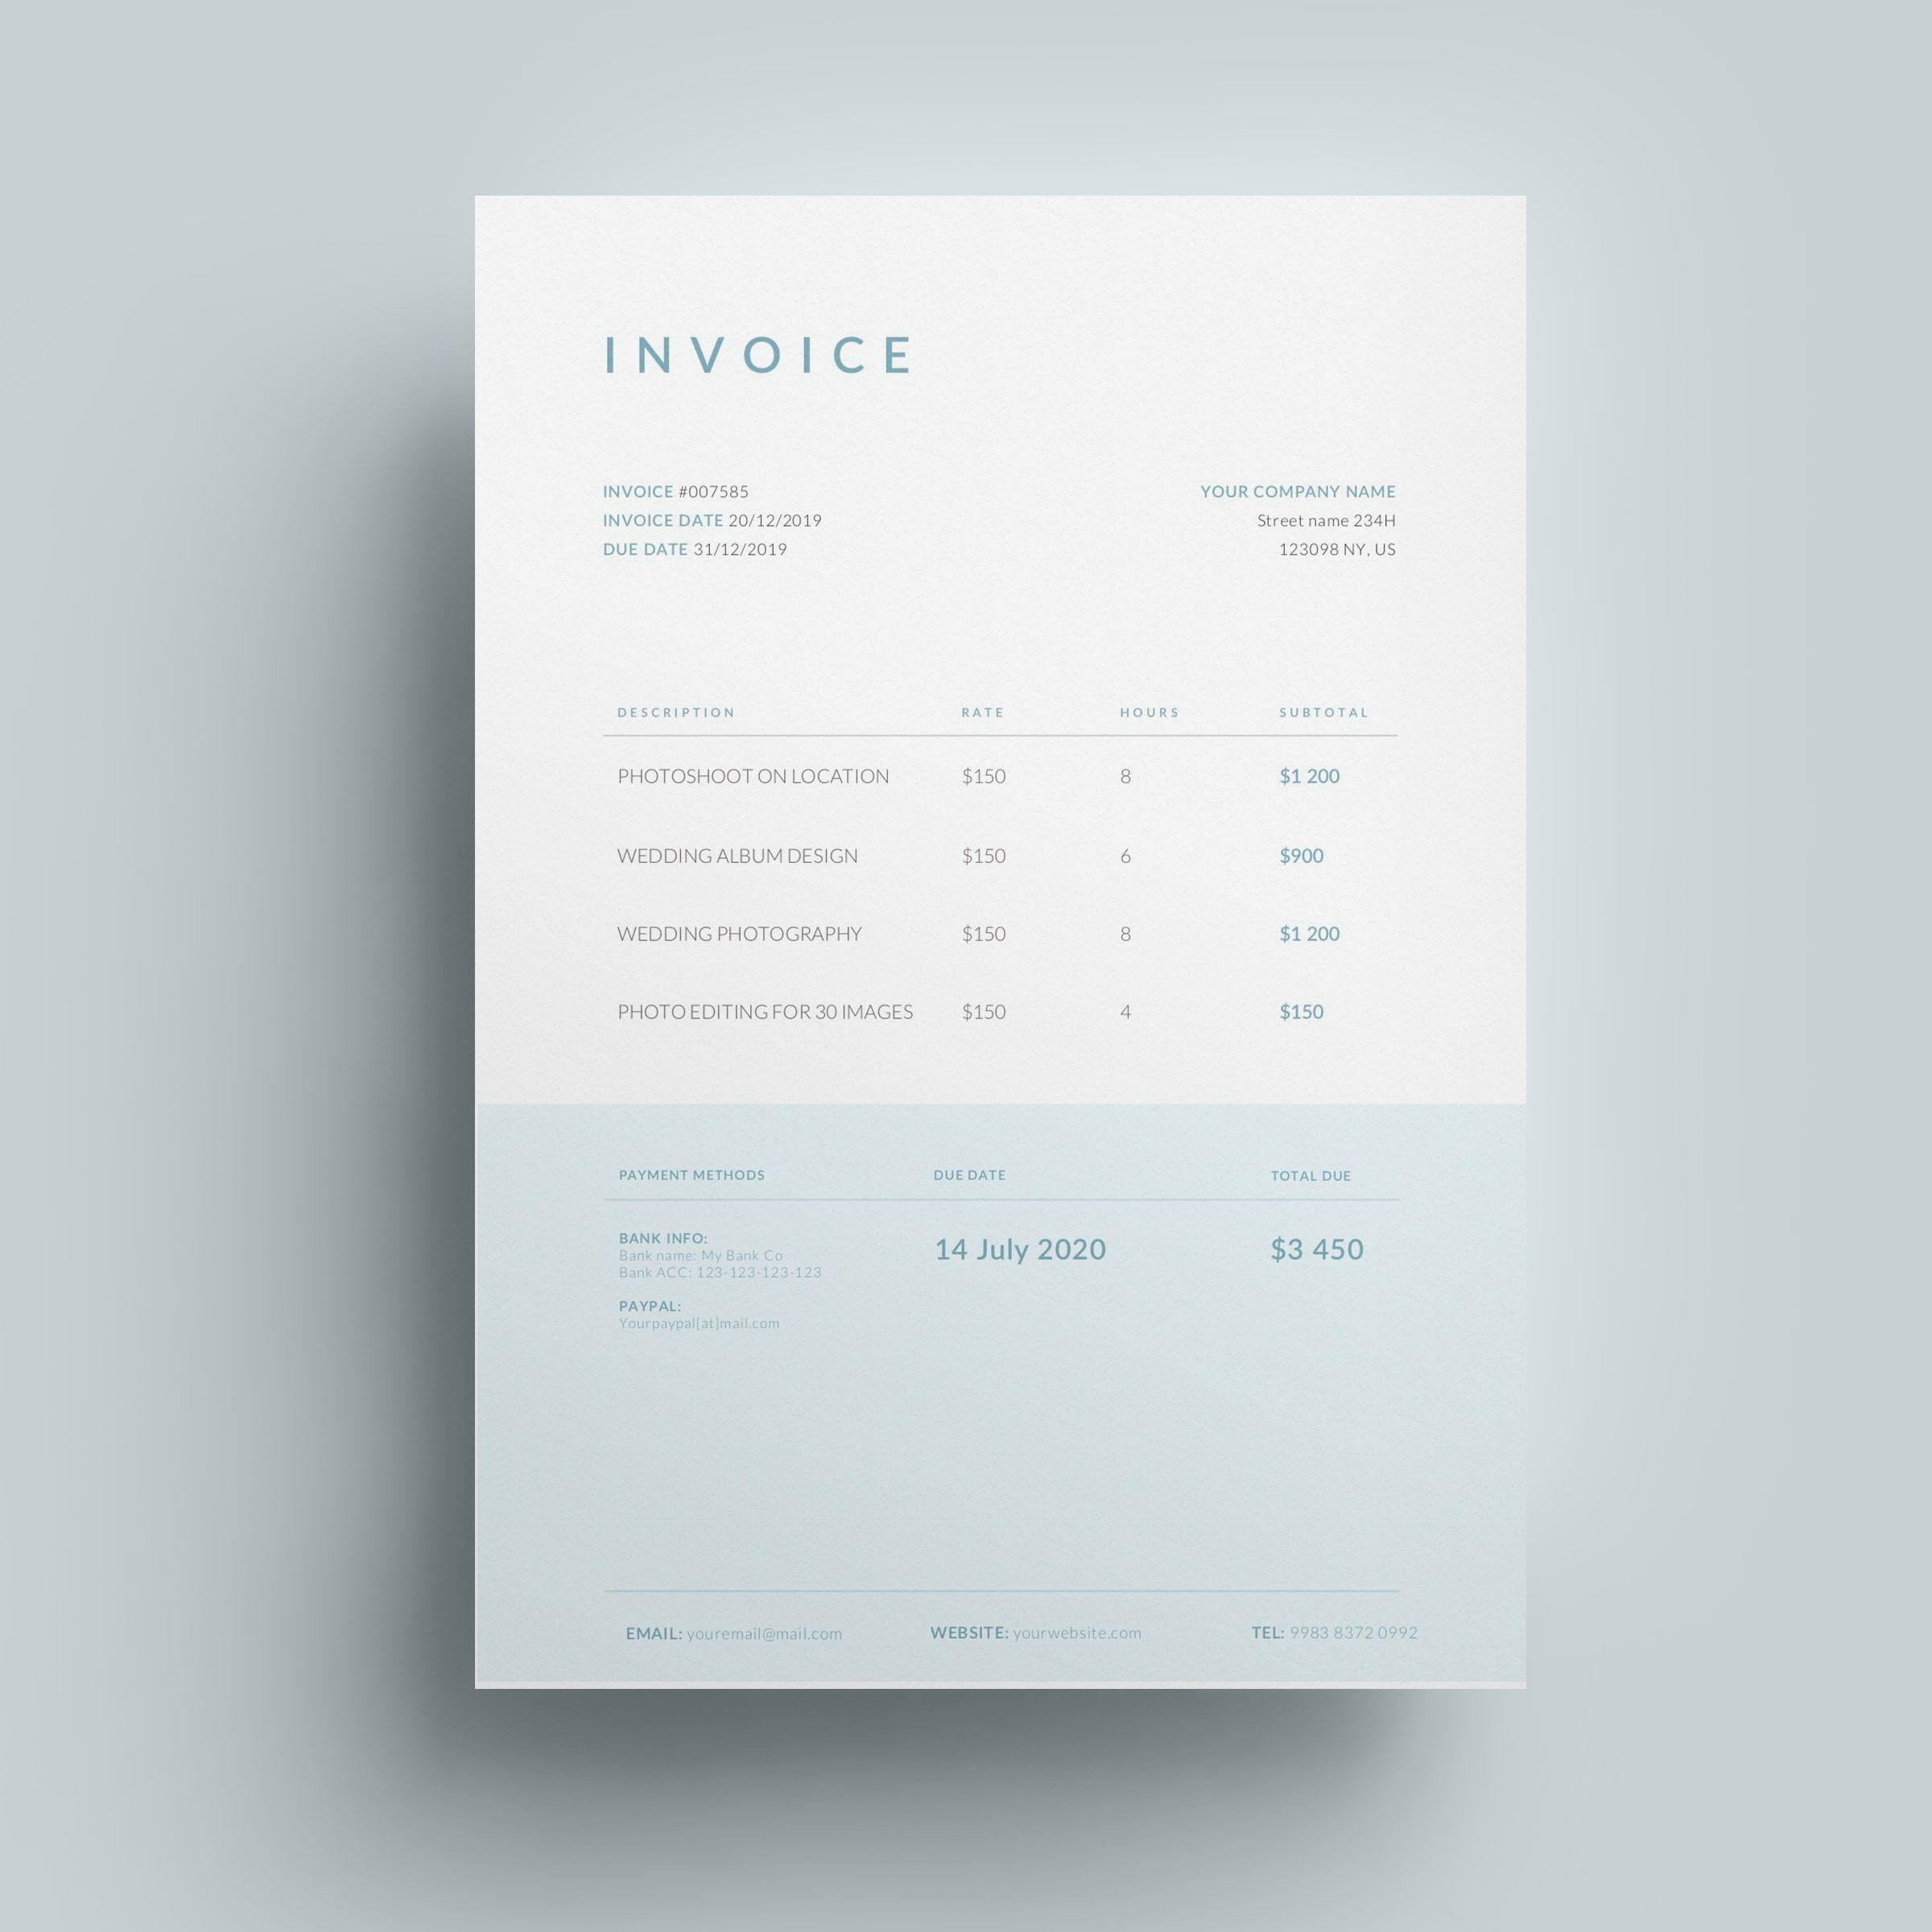 Invoice Template Business Invoice Receipt Template Etsy Invoice Design Invoice Template Photography Invoice Template